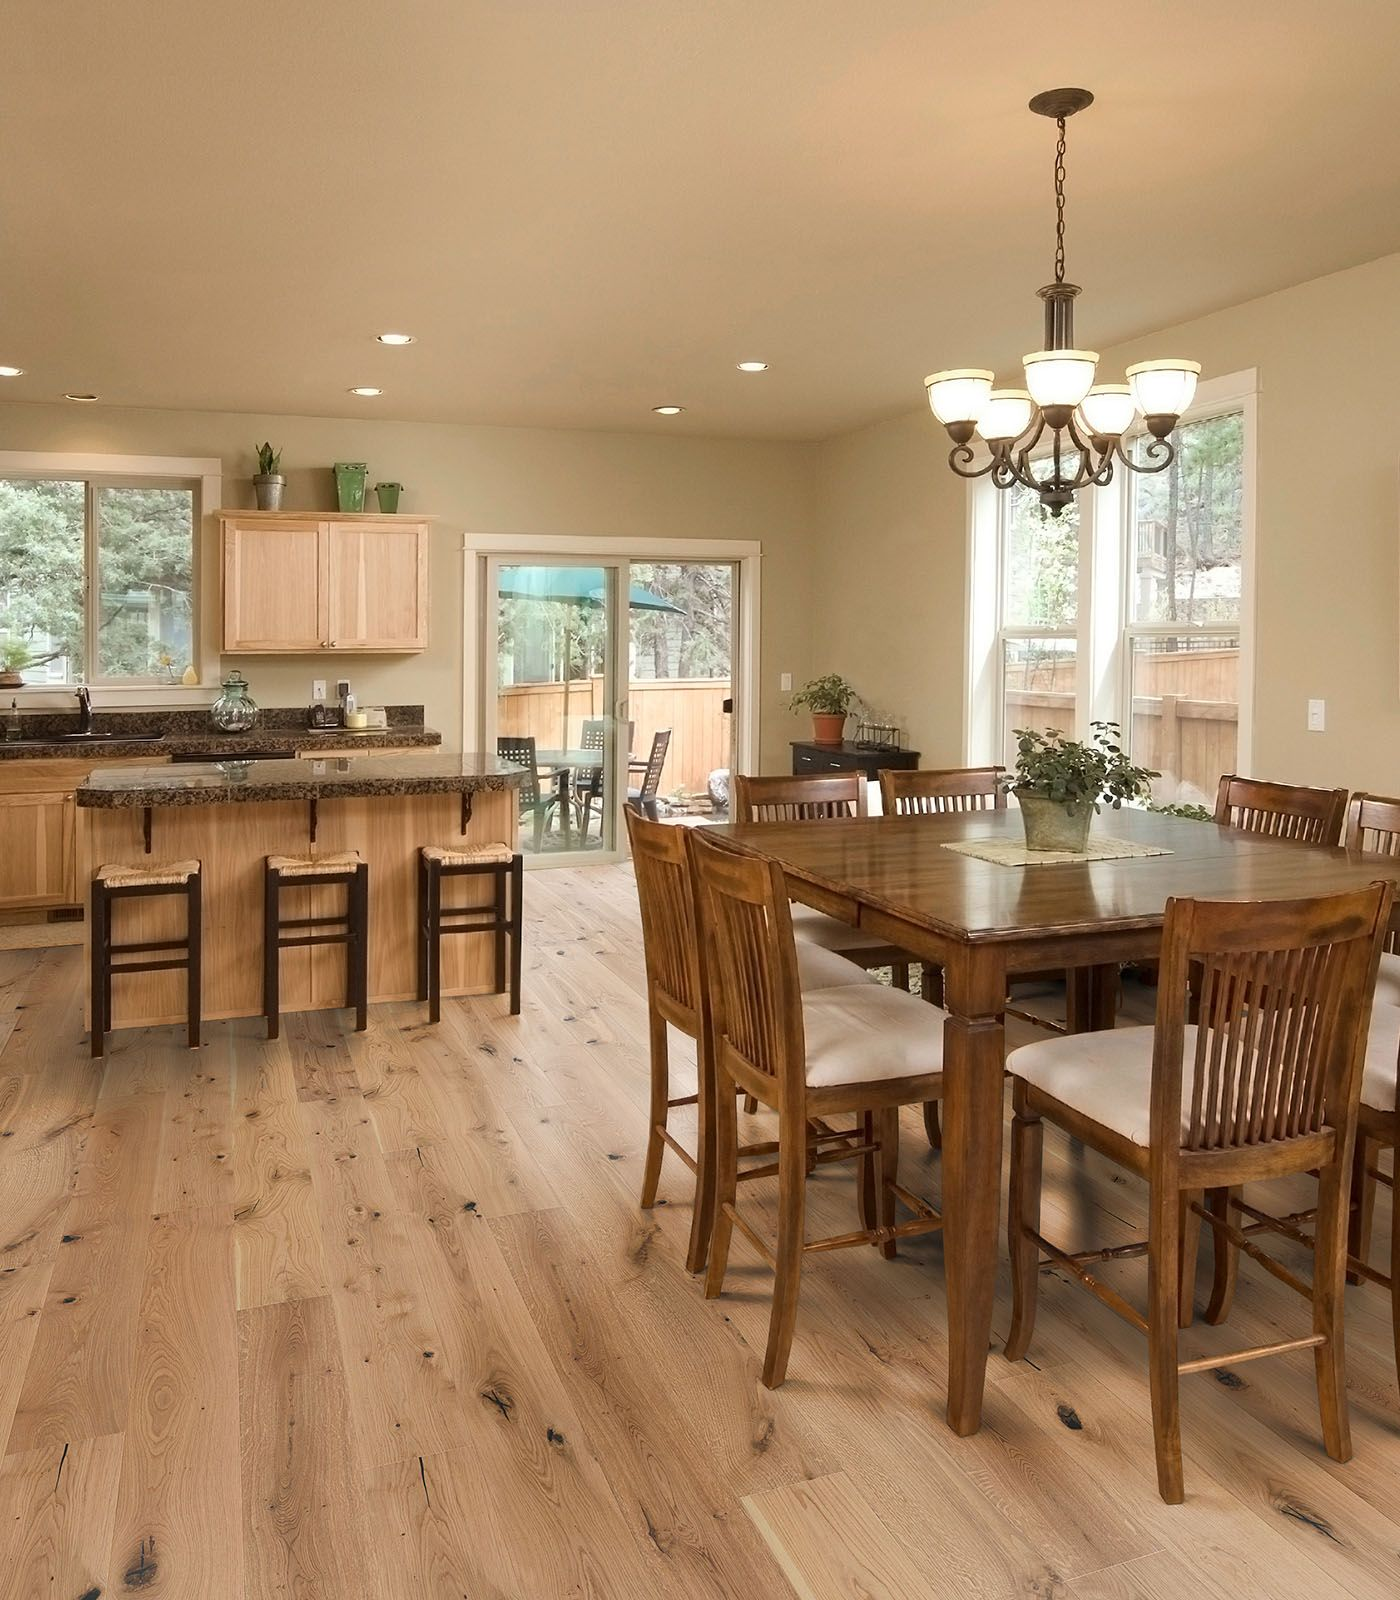 Full Size of Bodenbelag Küche Altbau Bodenbelag Küche Und Wohnzimmer Bodenbelag Für Küche Bodenbeläge Für Küche Und Flur Küche Bodenbelag Küche